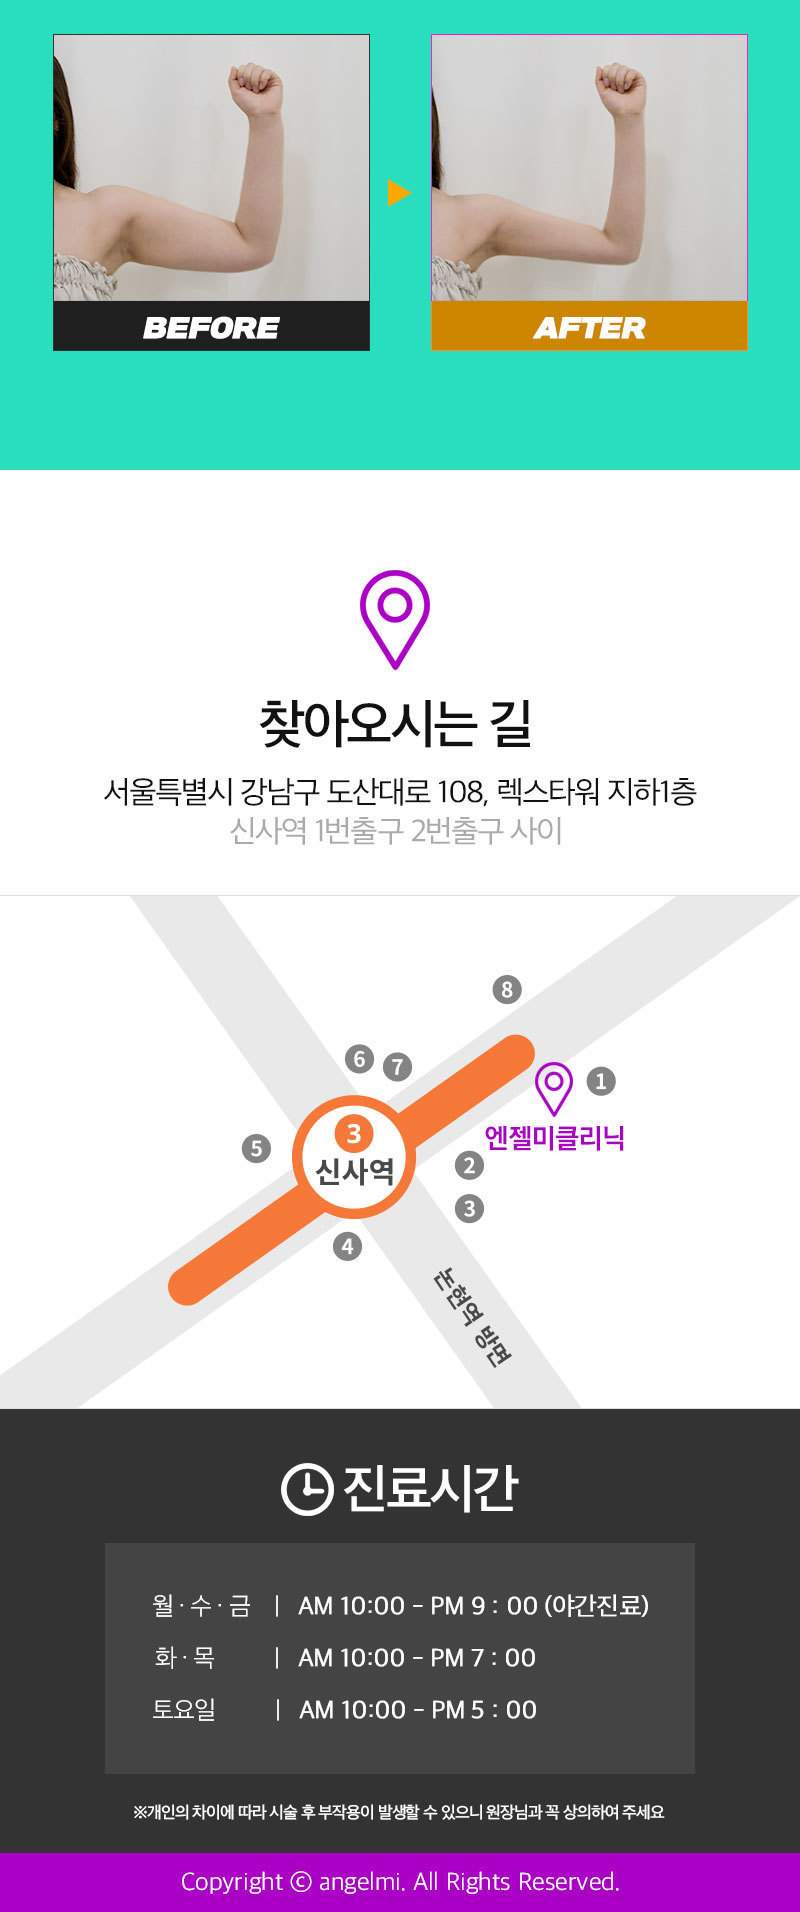 D event info 648043c5ccfa9f351d